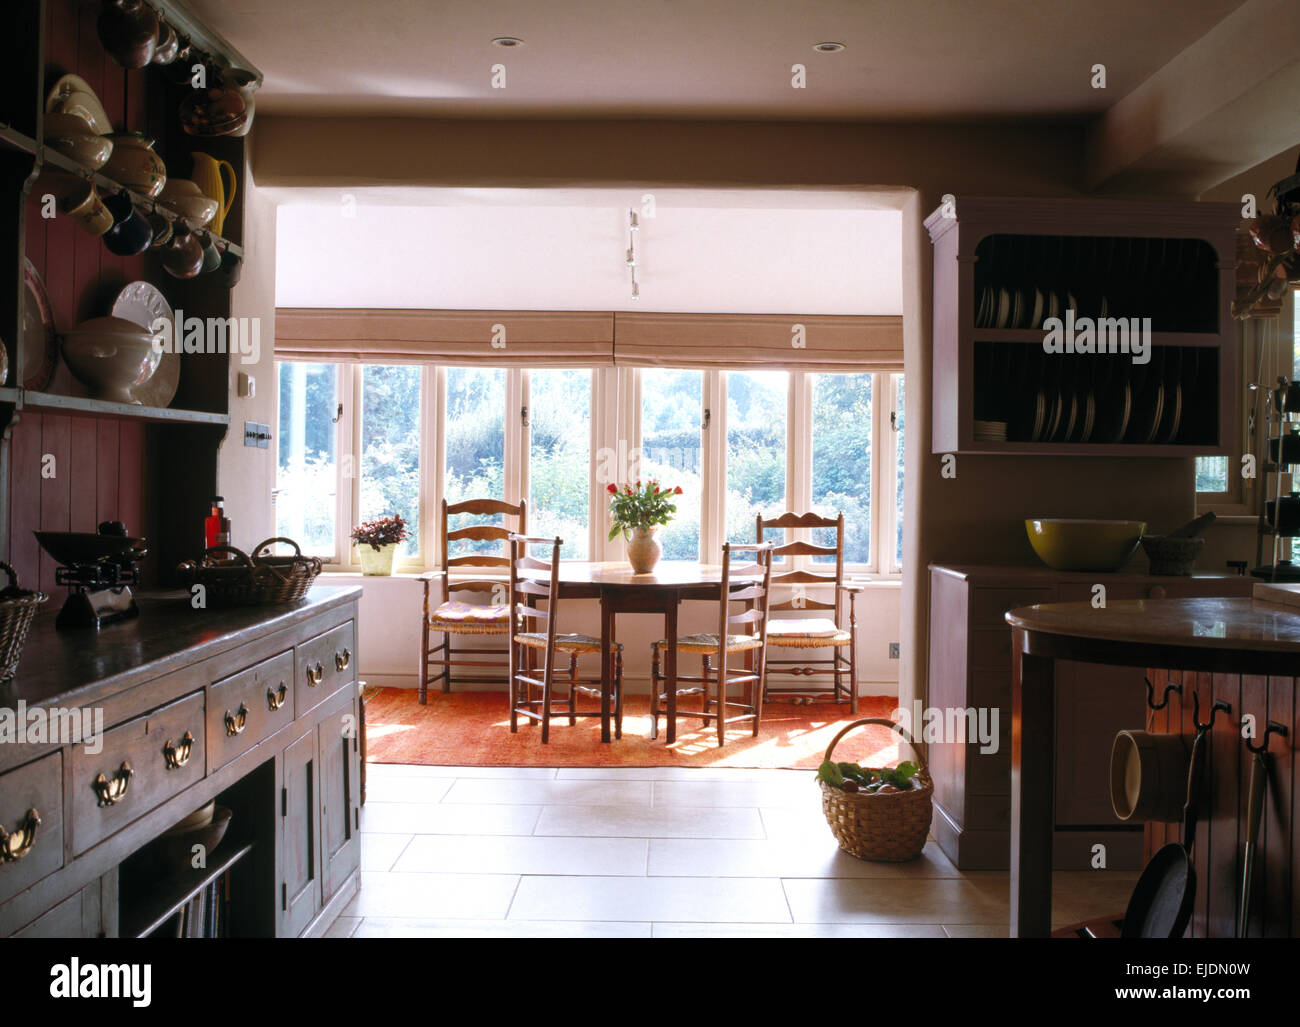 Mobili Antichi Per Sala Da Pranzo : Aprire paese piano cucina e sala da pranzo con mobili antichi di